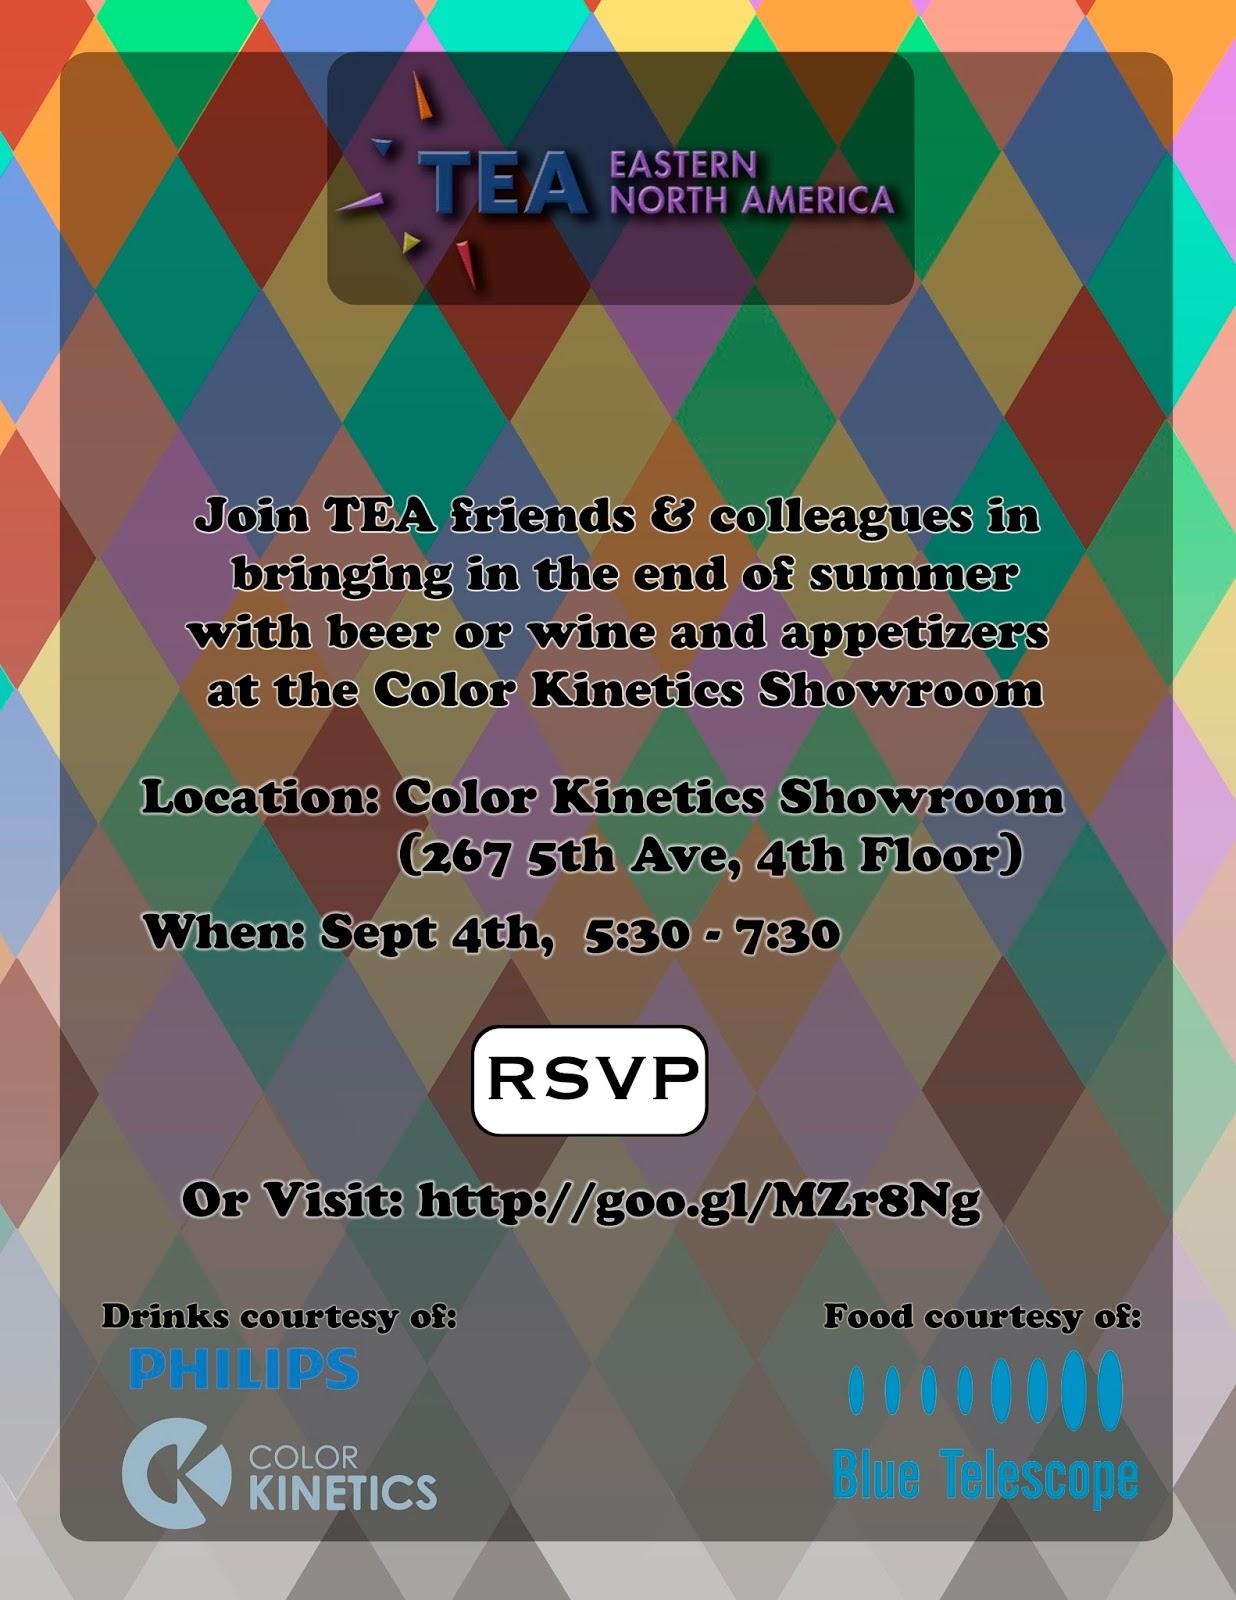 NYC, Sept 4: Mixer at Color Kinetics